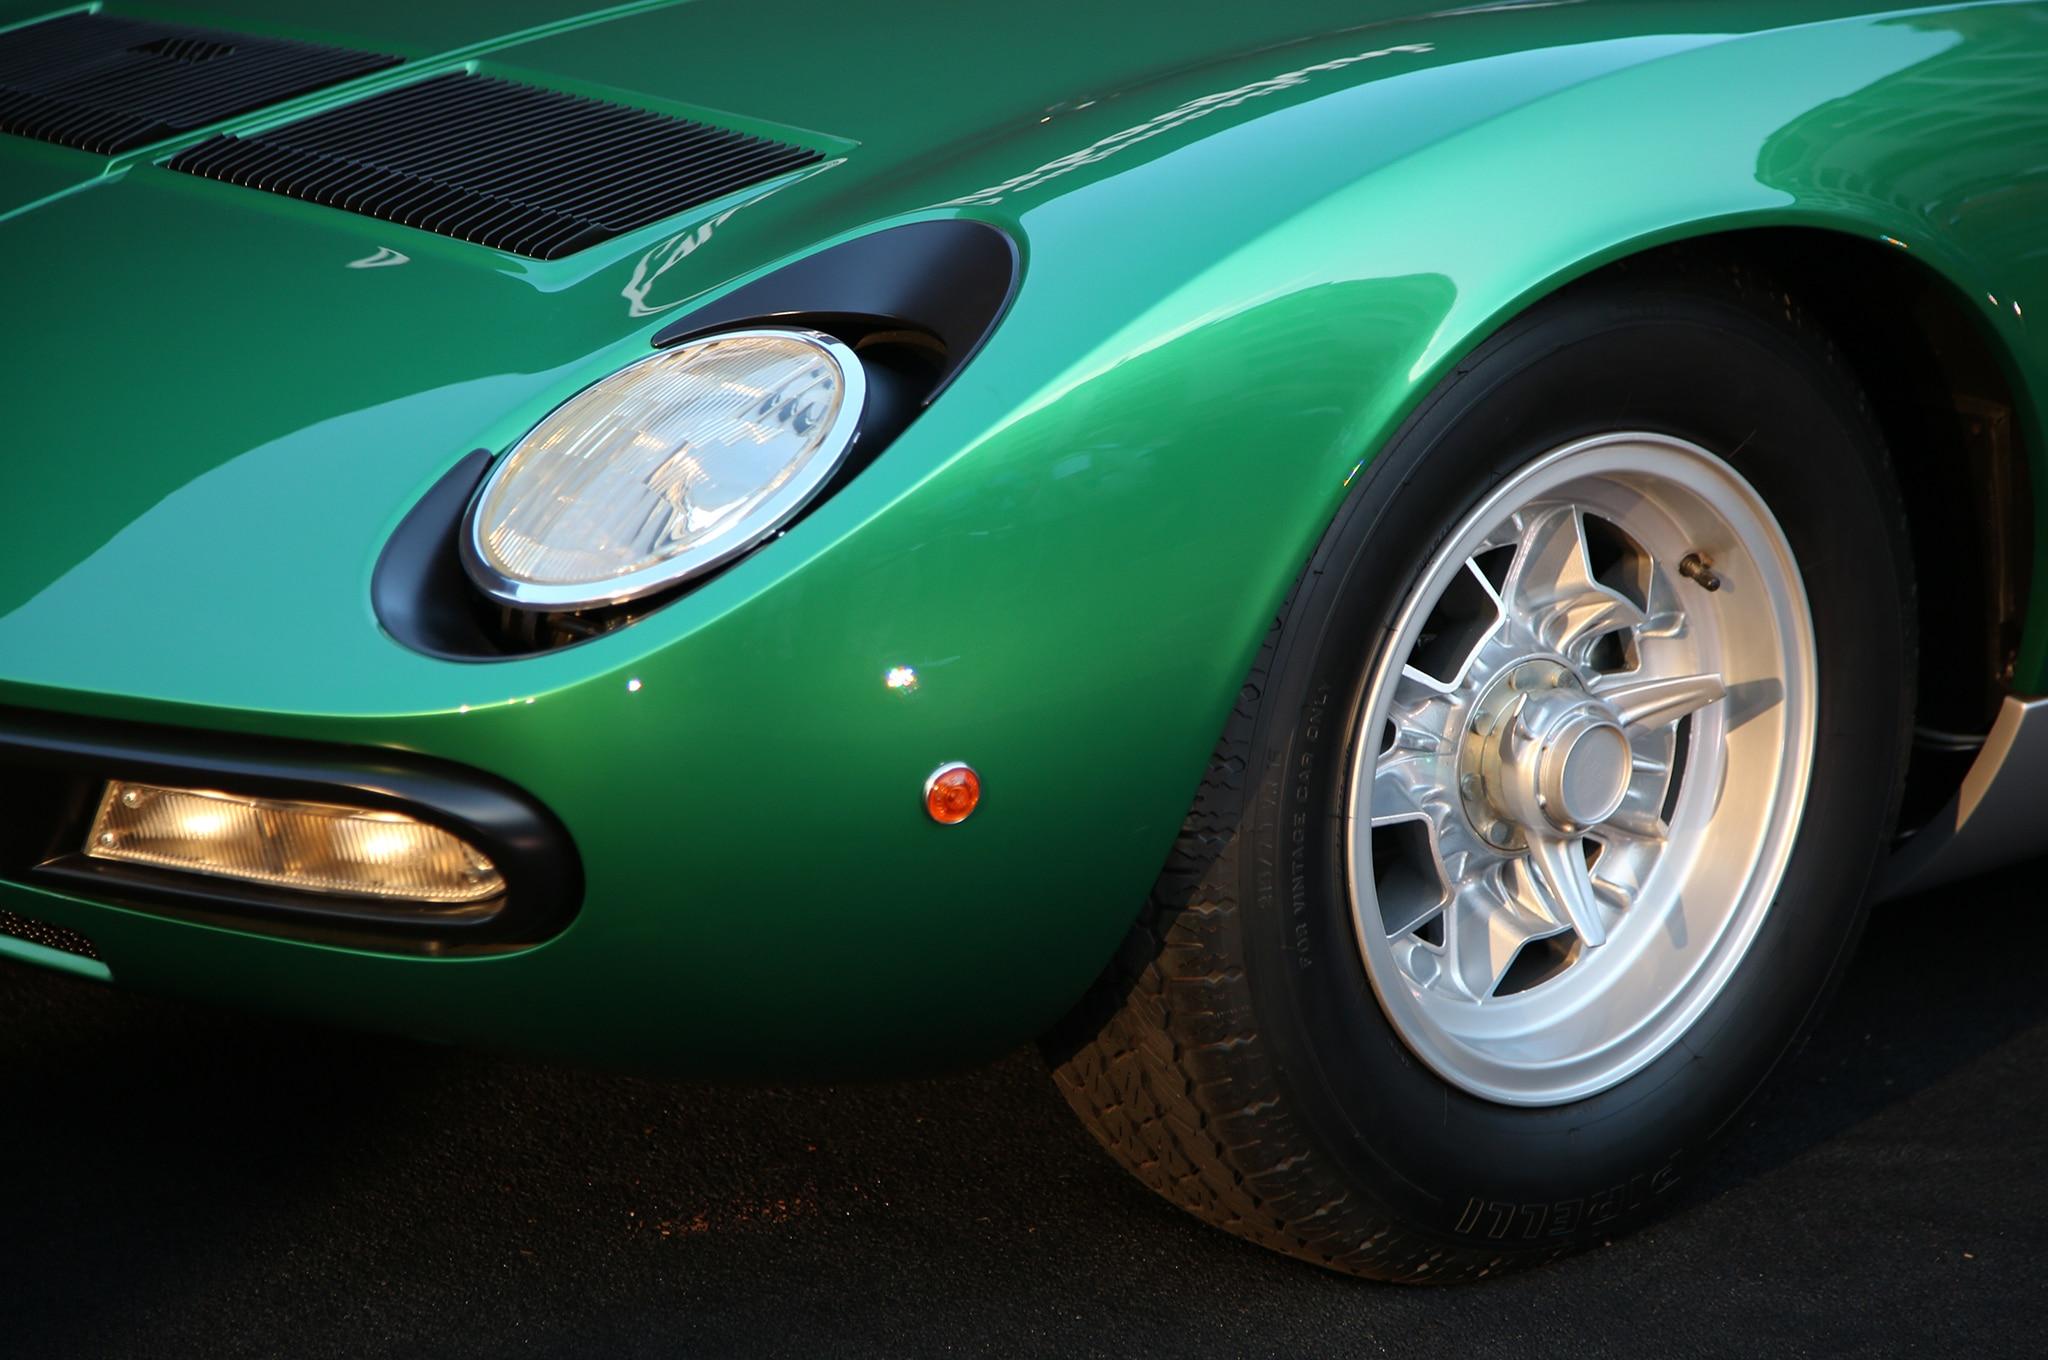 Here S What The New Lamborghini Miura Should Look Like